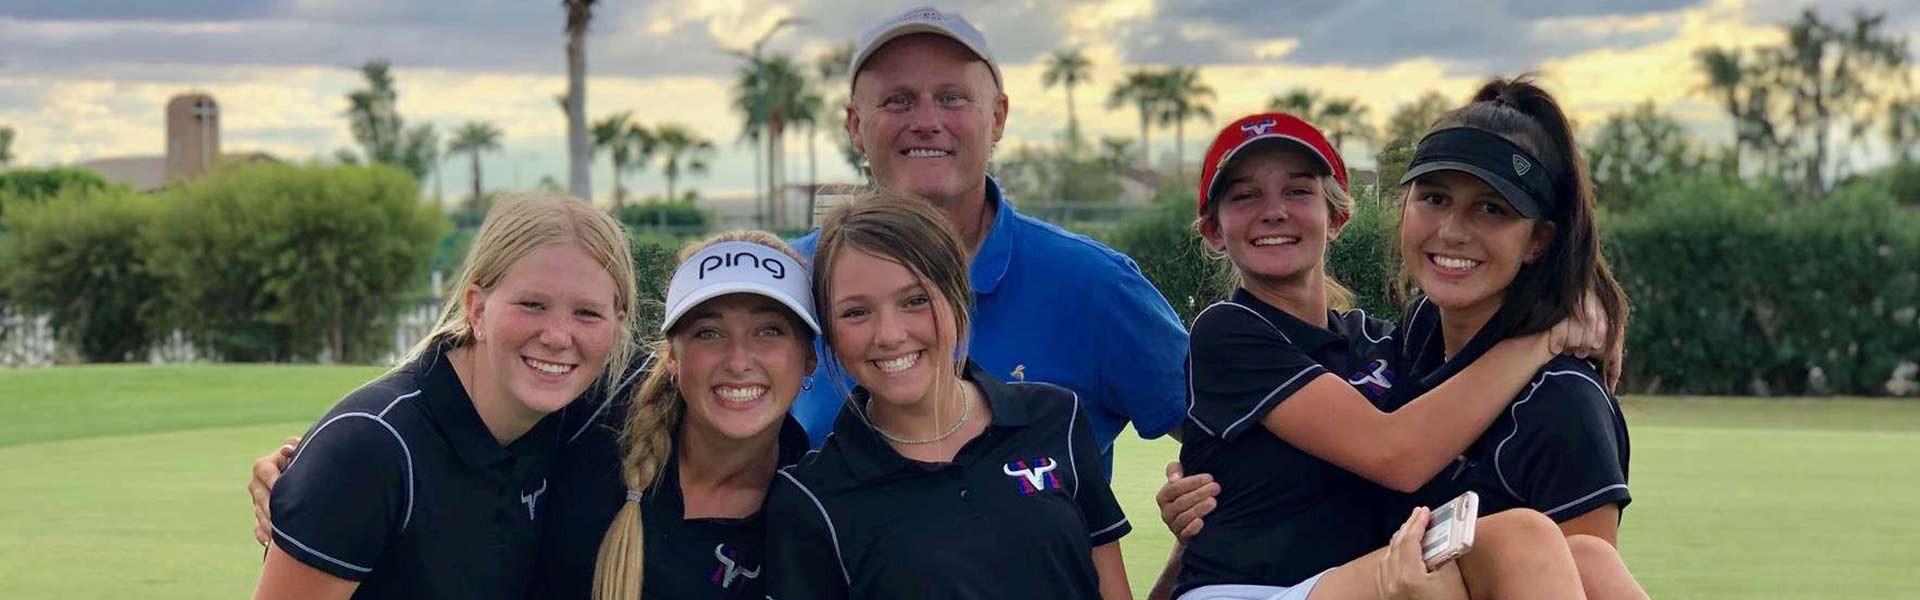 Mesa Public School Golf Team